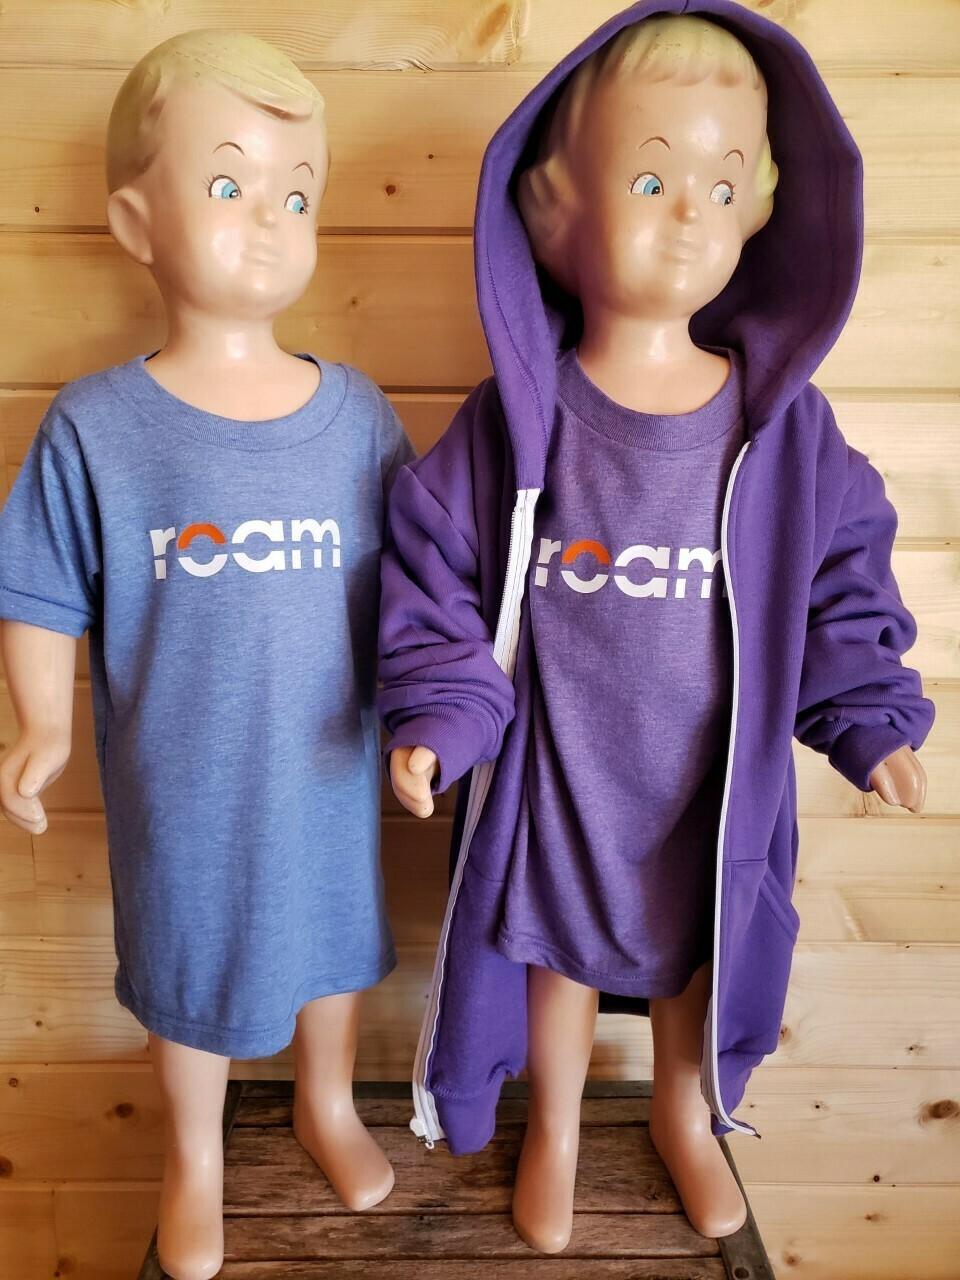 roam Youth Zip Hoodies- Unisex